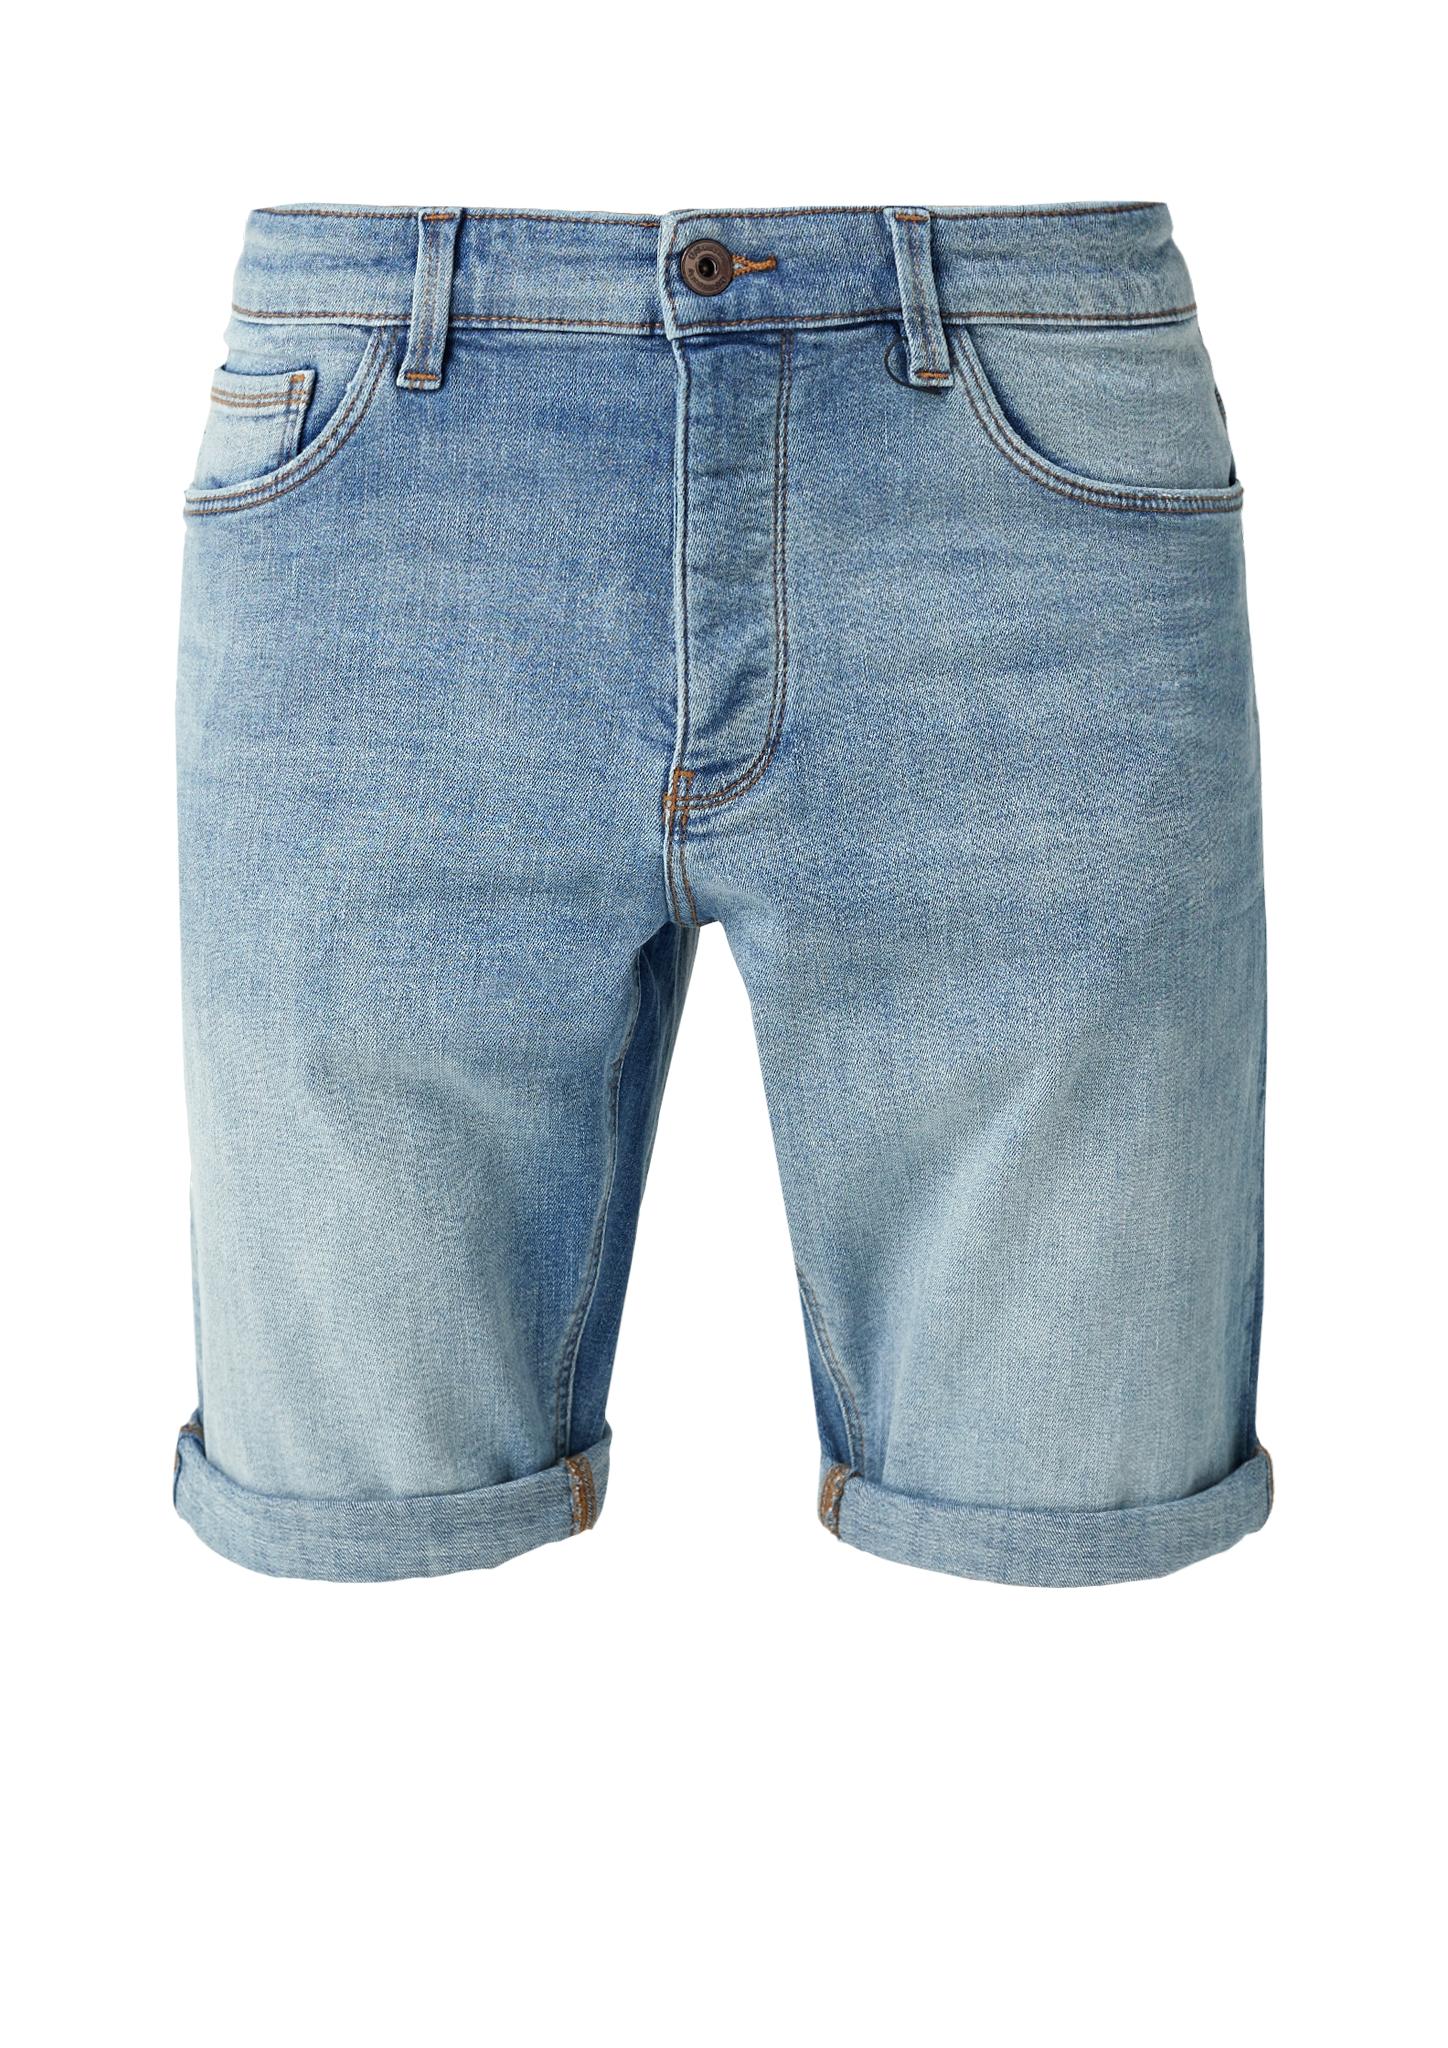 Baumwoll-Bermuda | Bekleidung > Shorts & Bermudas | Blau | 98% baumwolle -  2% elasthan | Q/S designed by